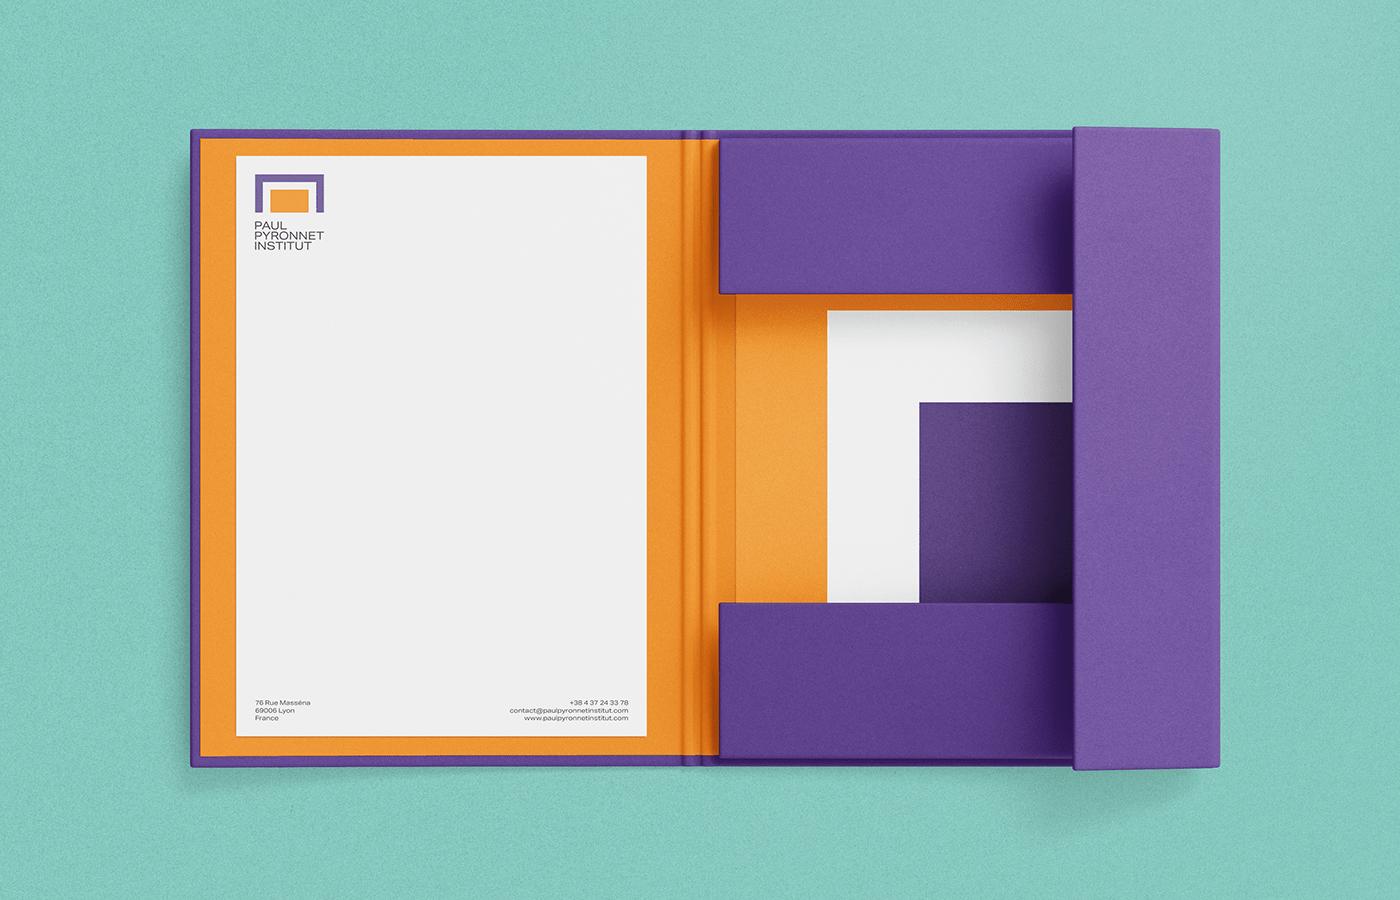 Paul Pyronnet Institut letterhead and folder